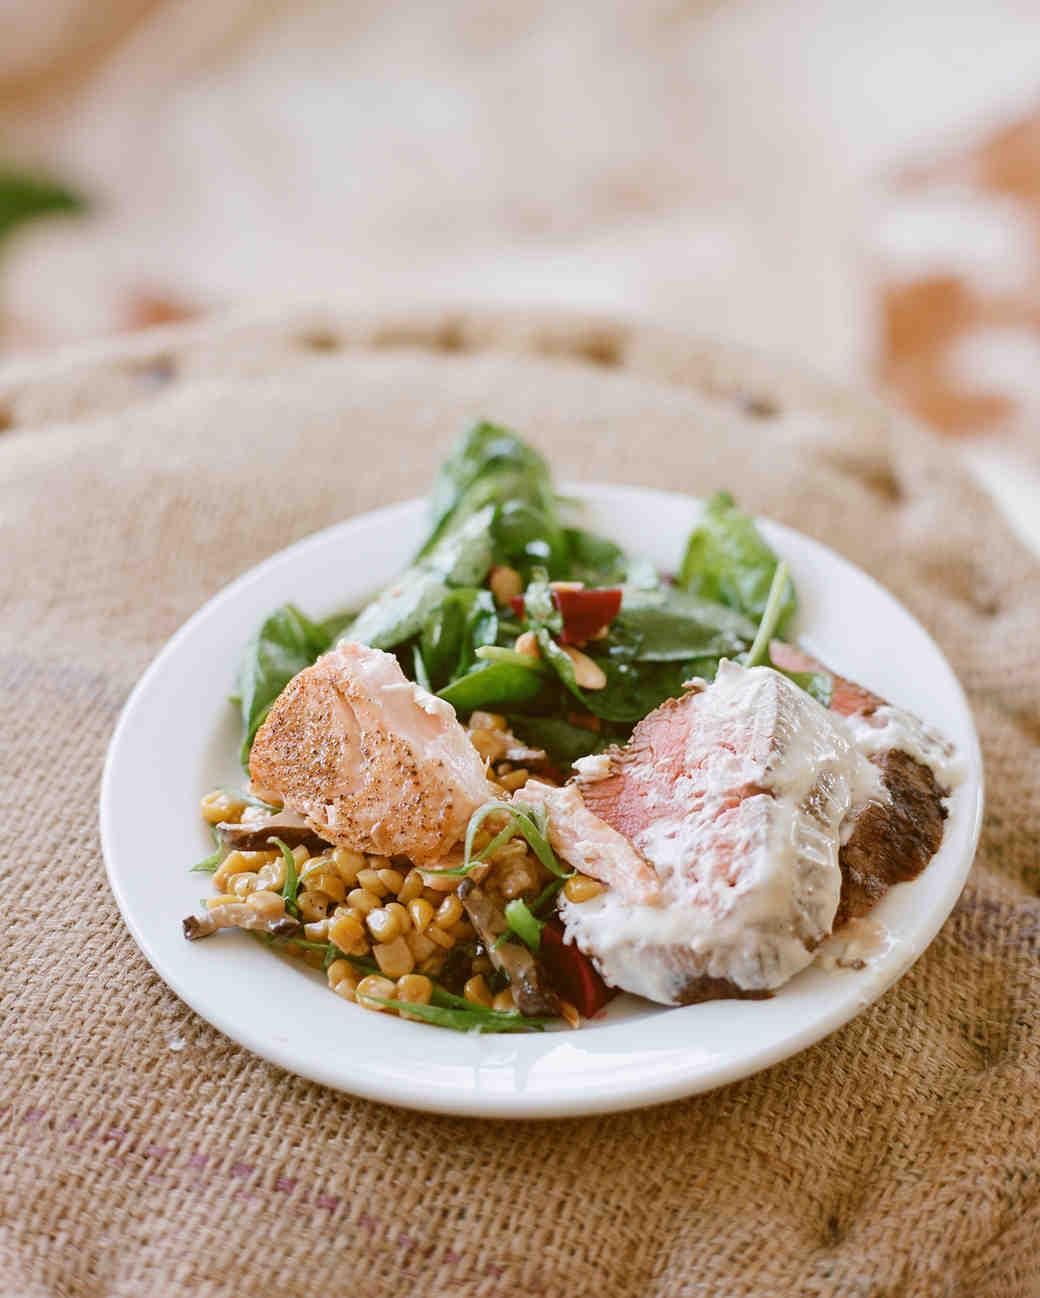 callie-eric-wedding-food-625-s112113-0815.jpg